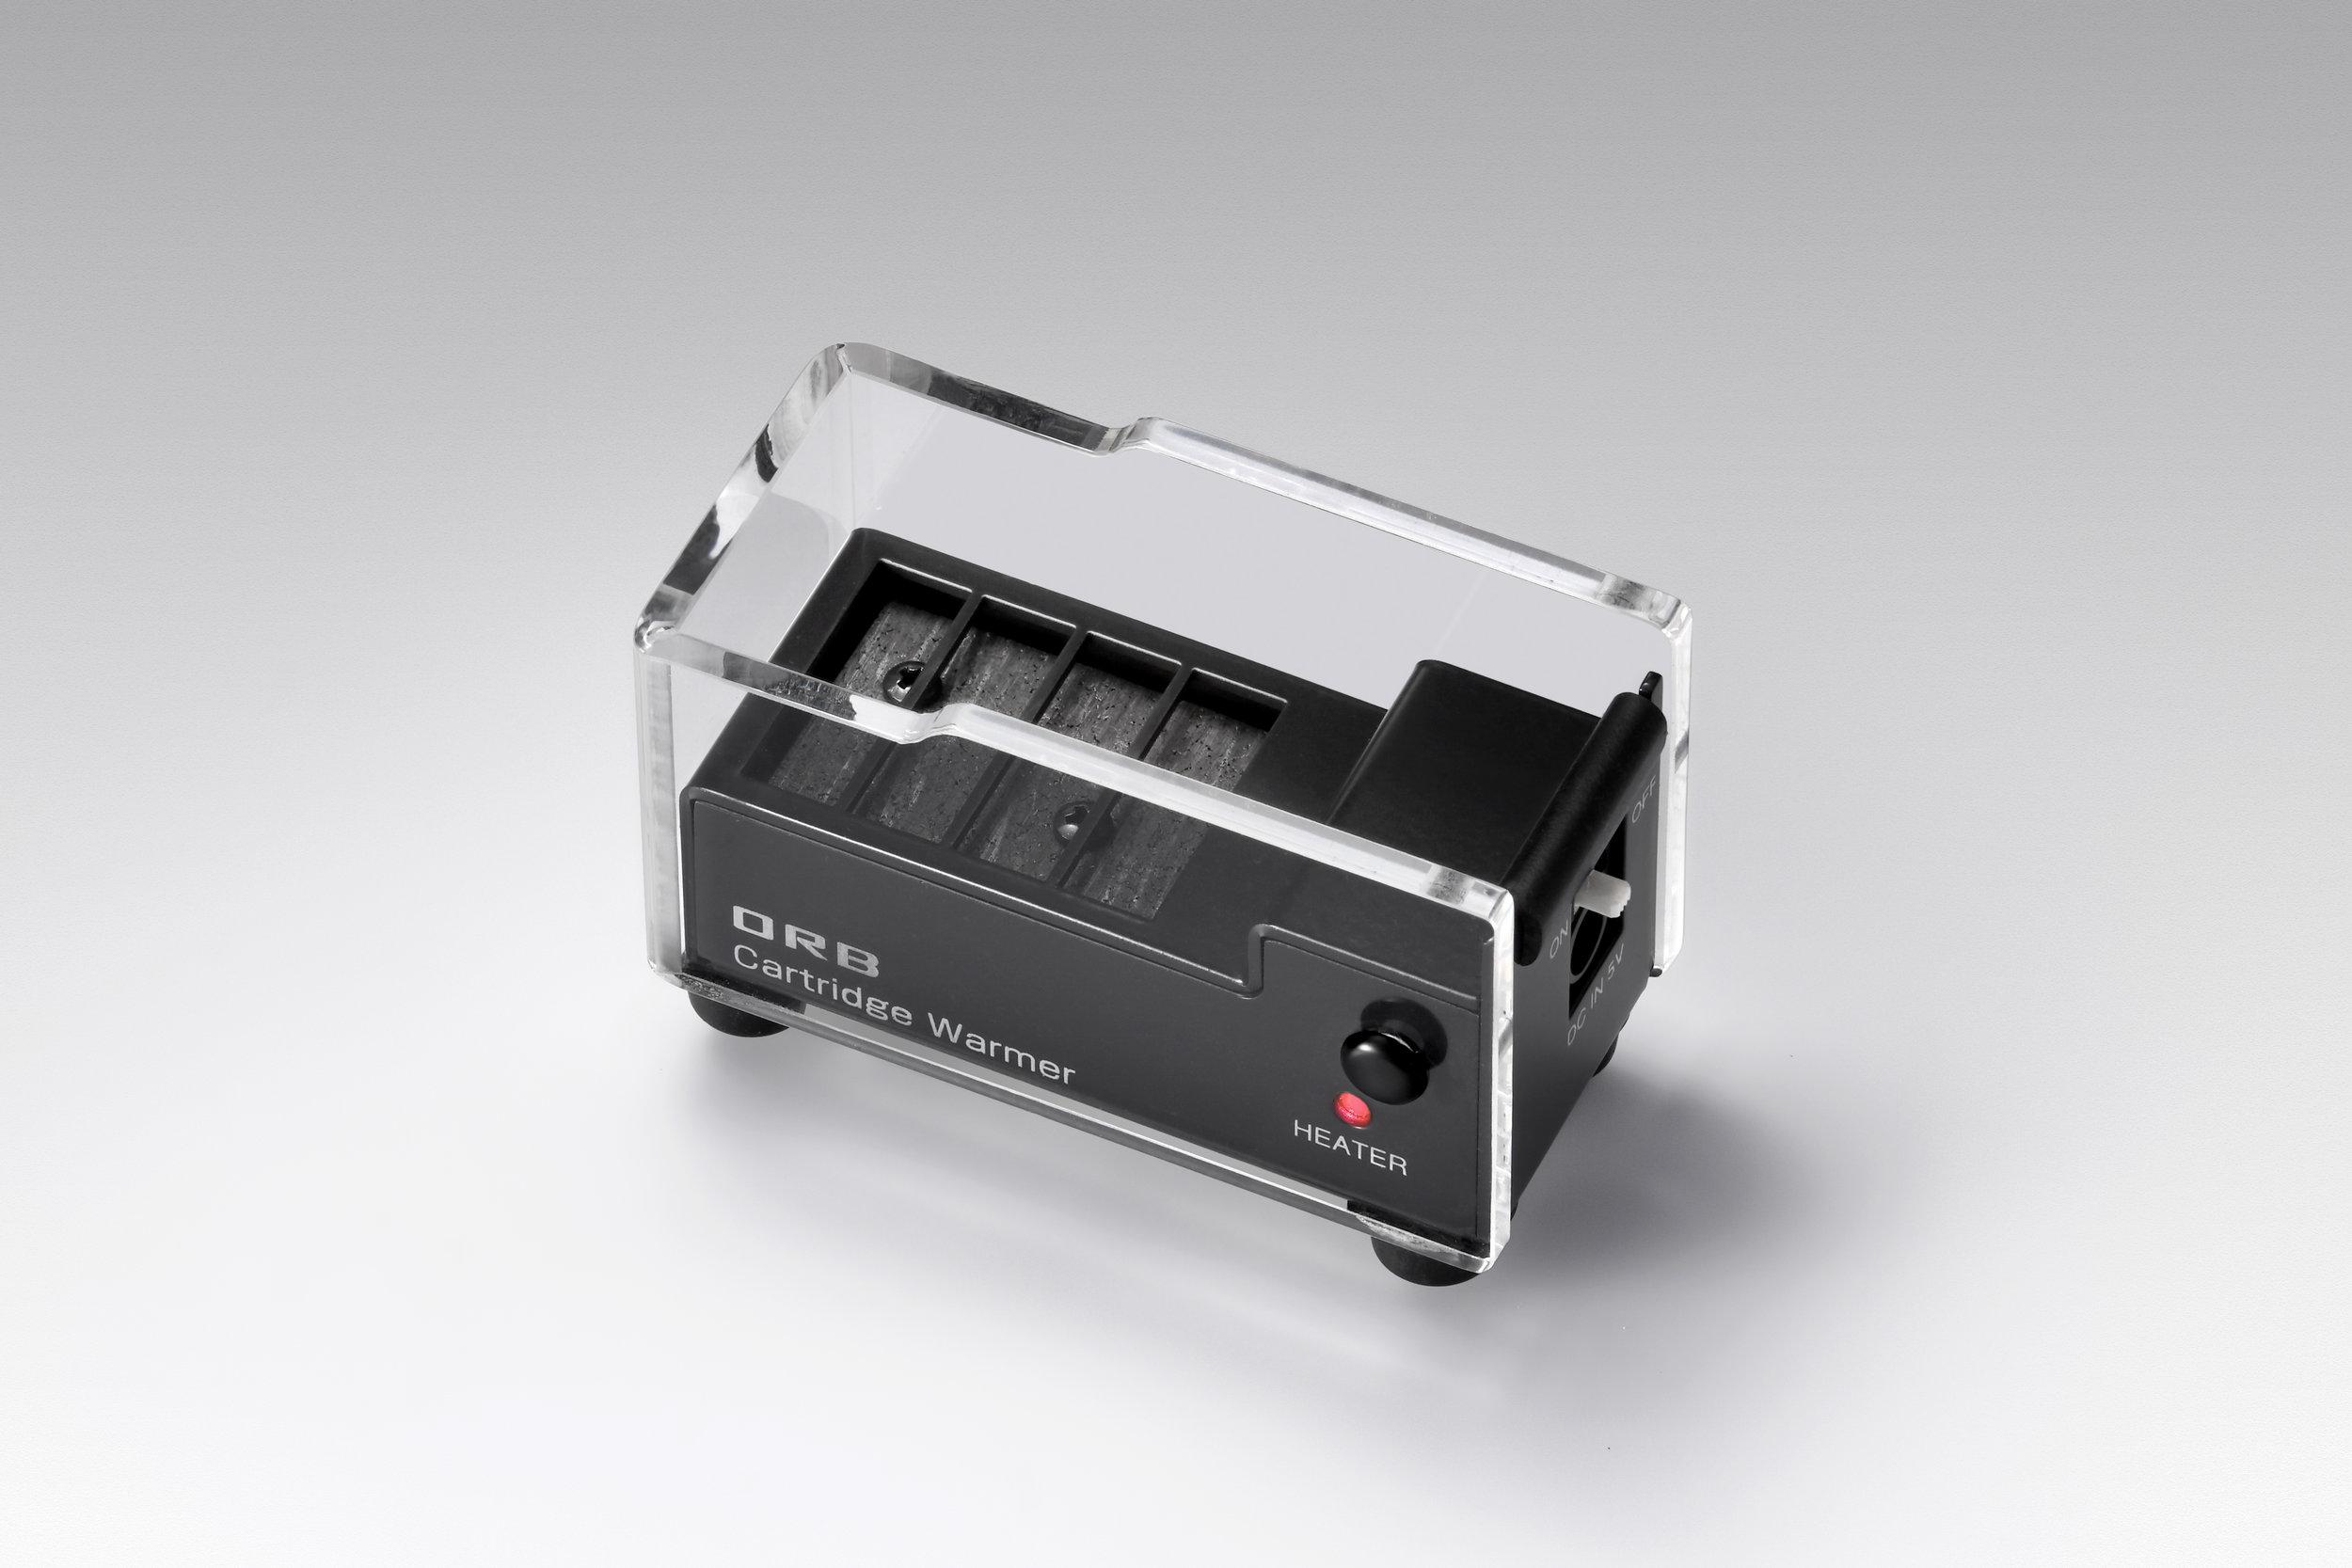 Cartridge Warmer